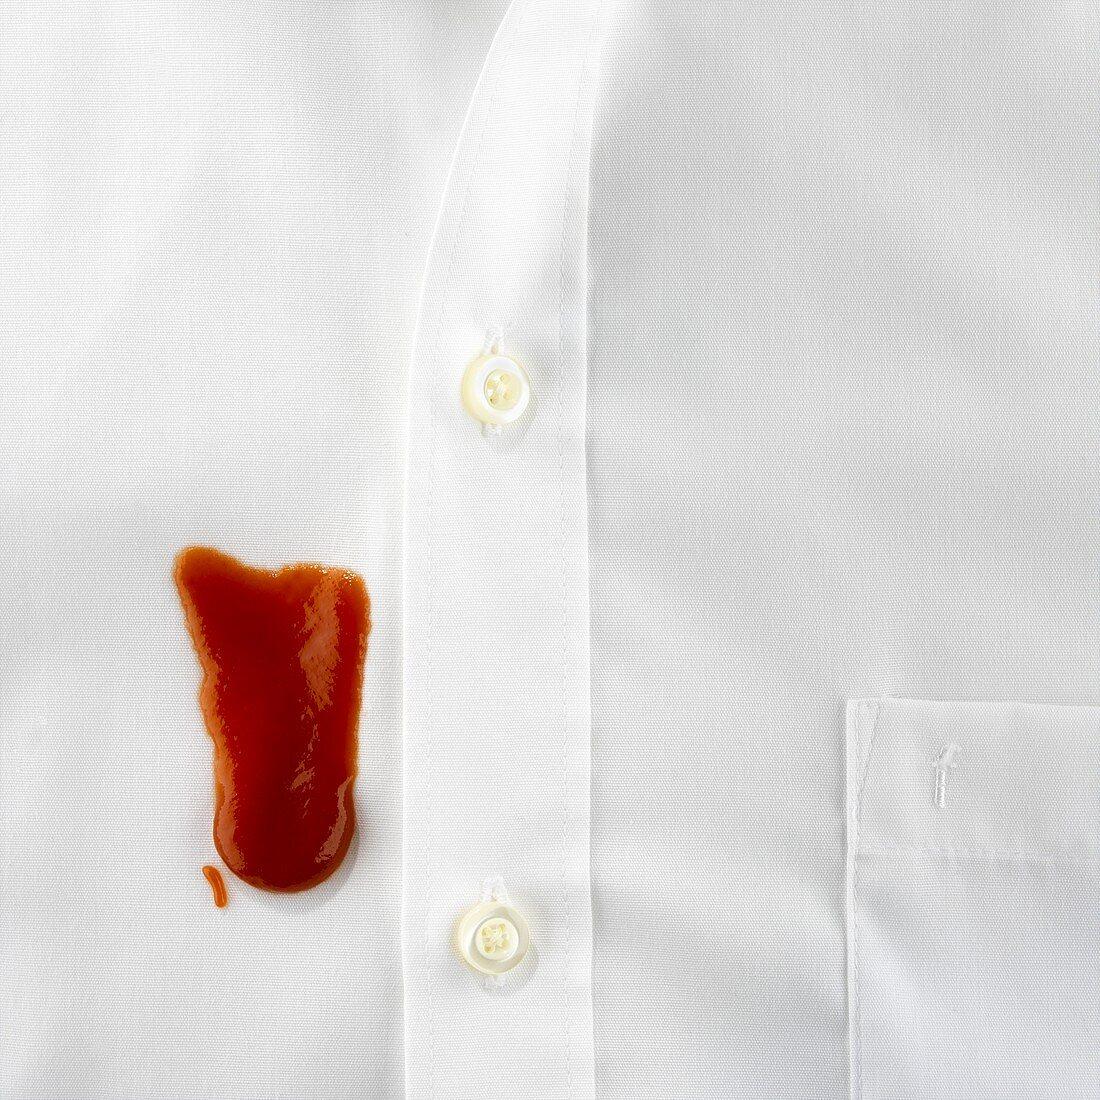 Blob of ketchup on white shirt